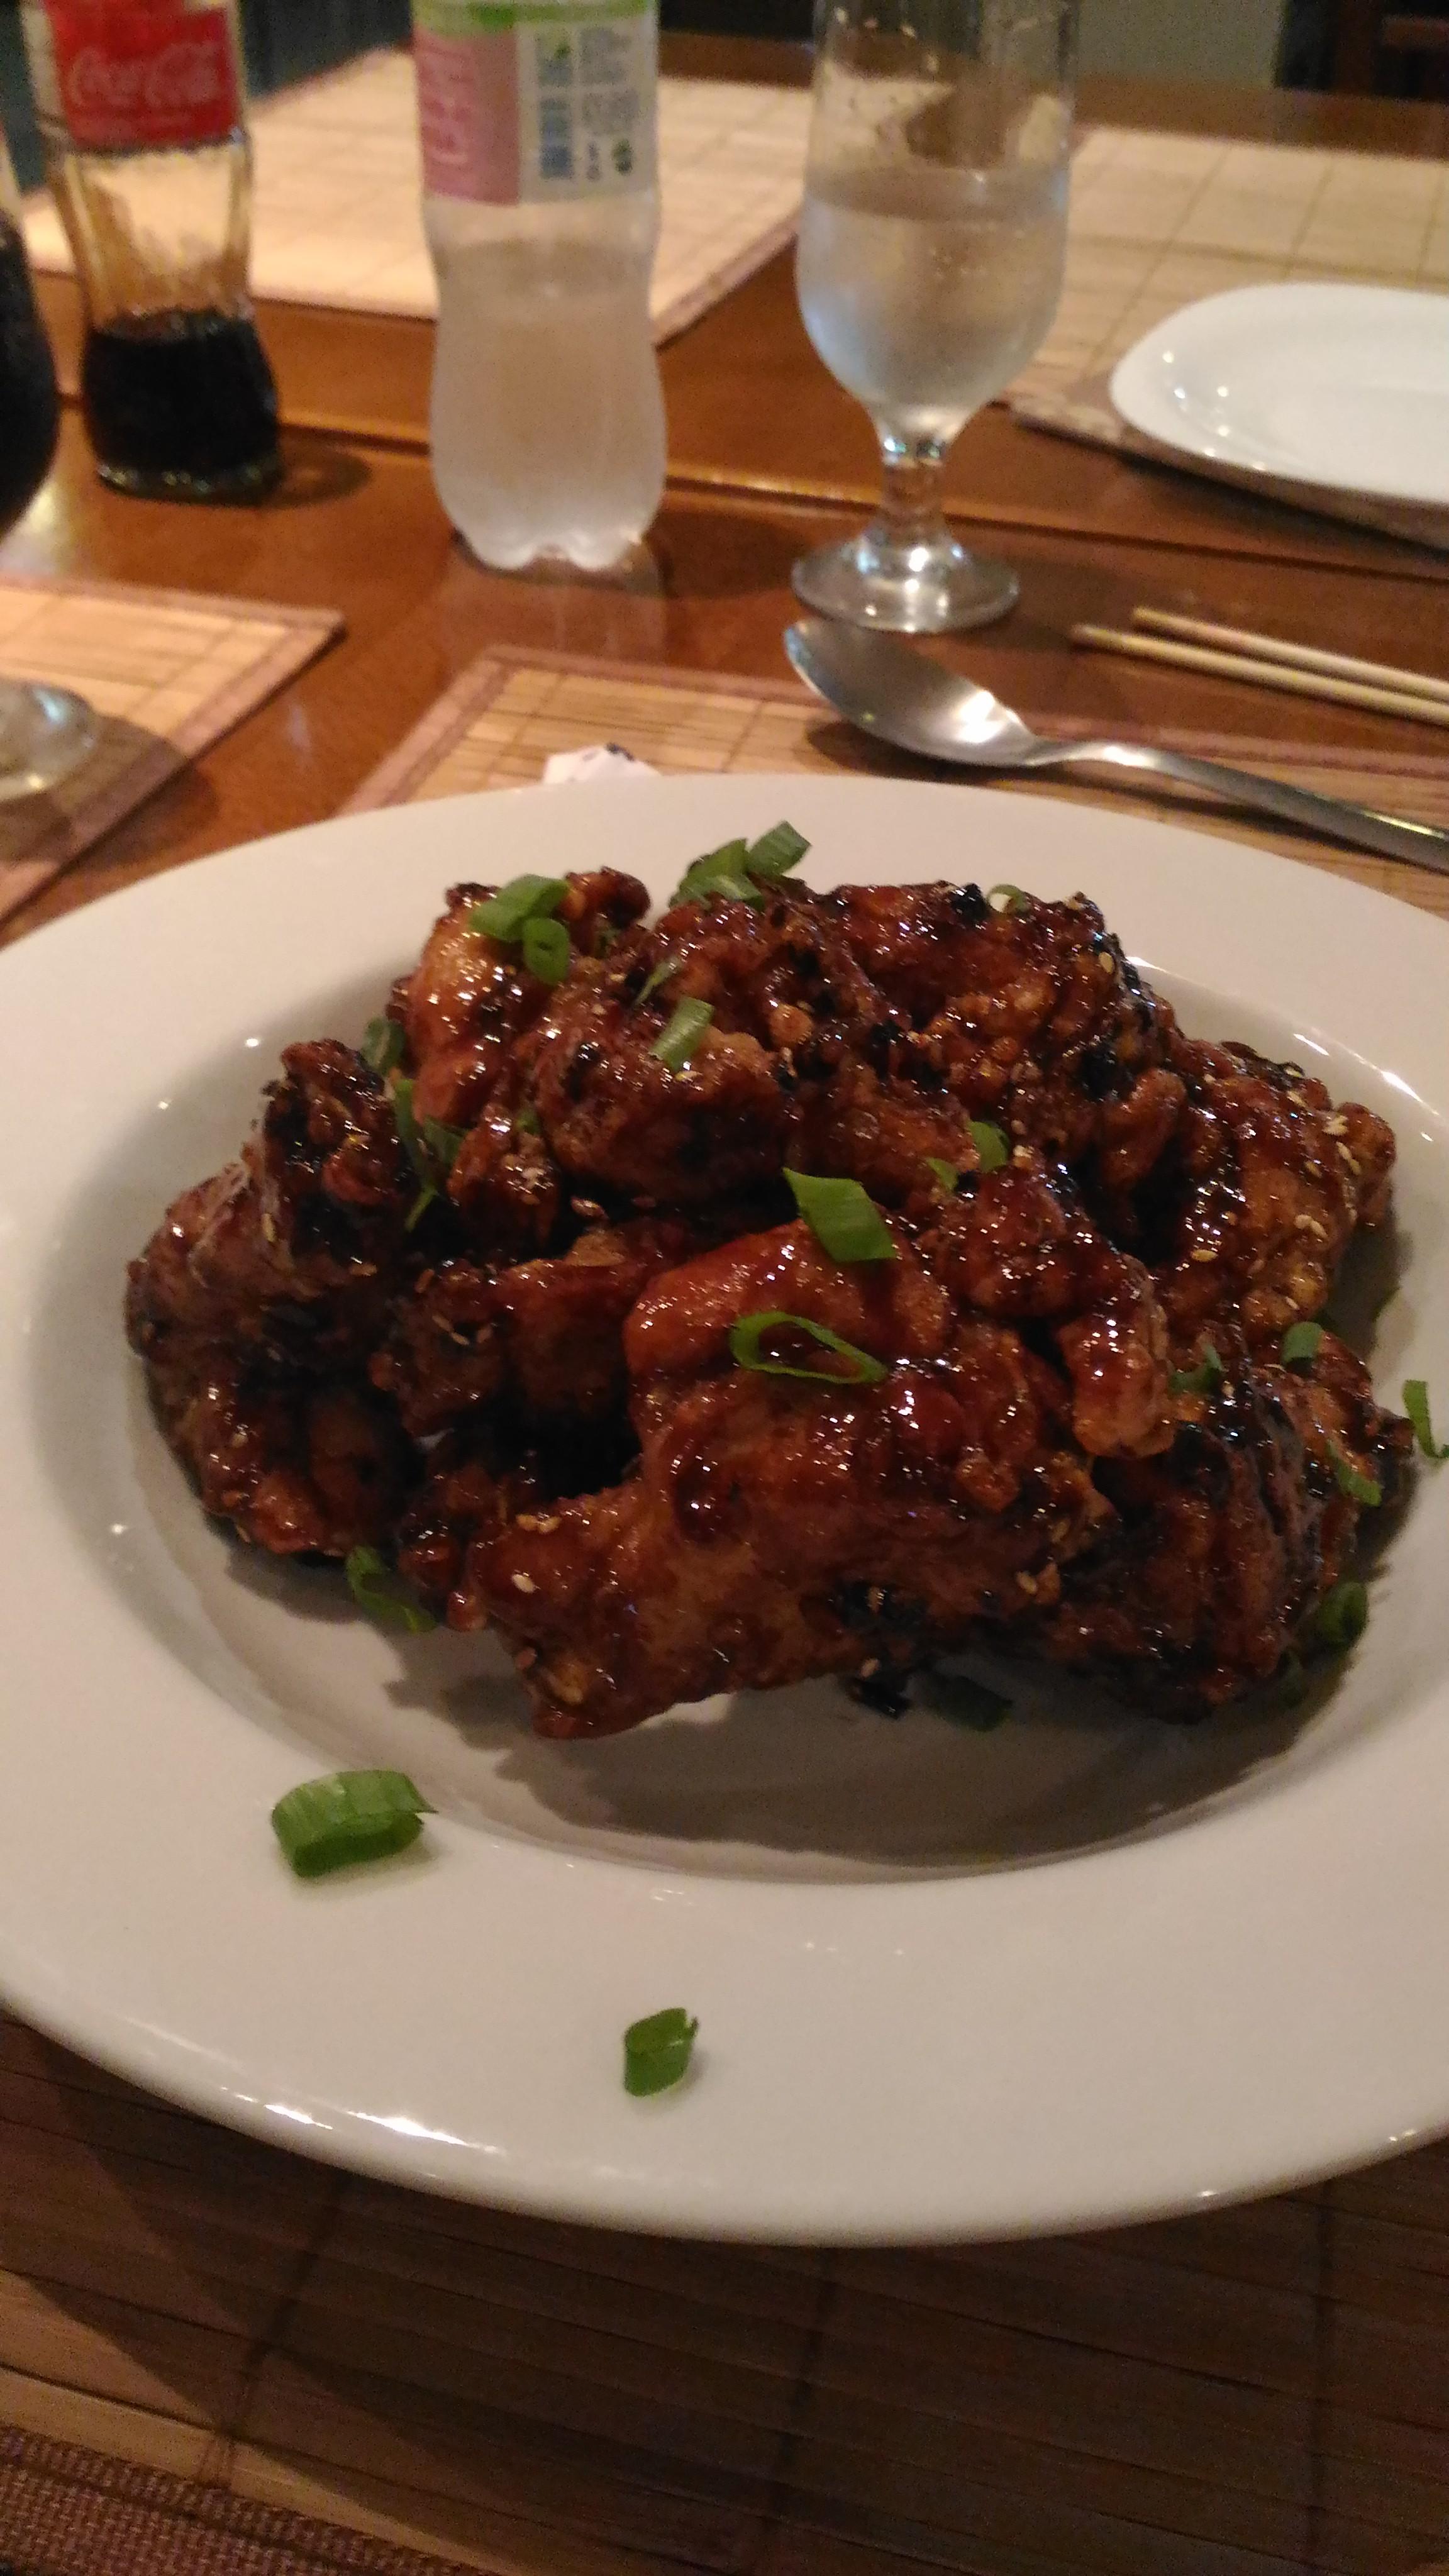 Dak-GangJeong. Frango frito crocante com agridoce.